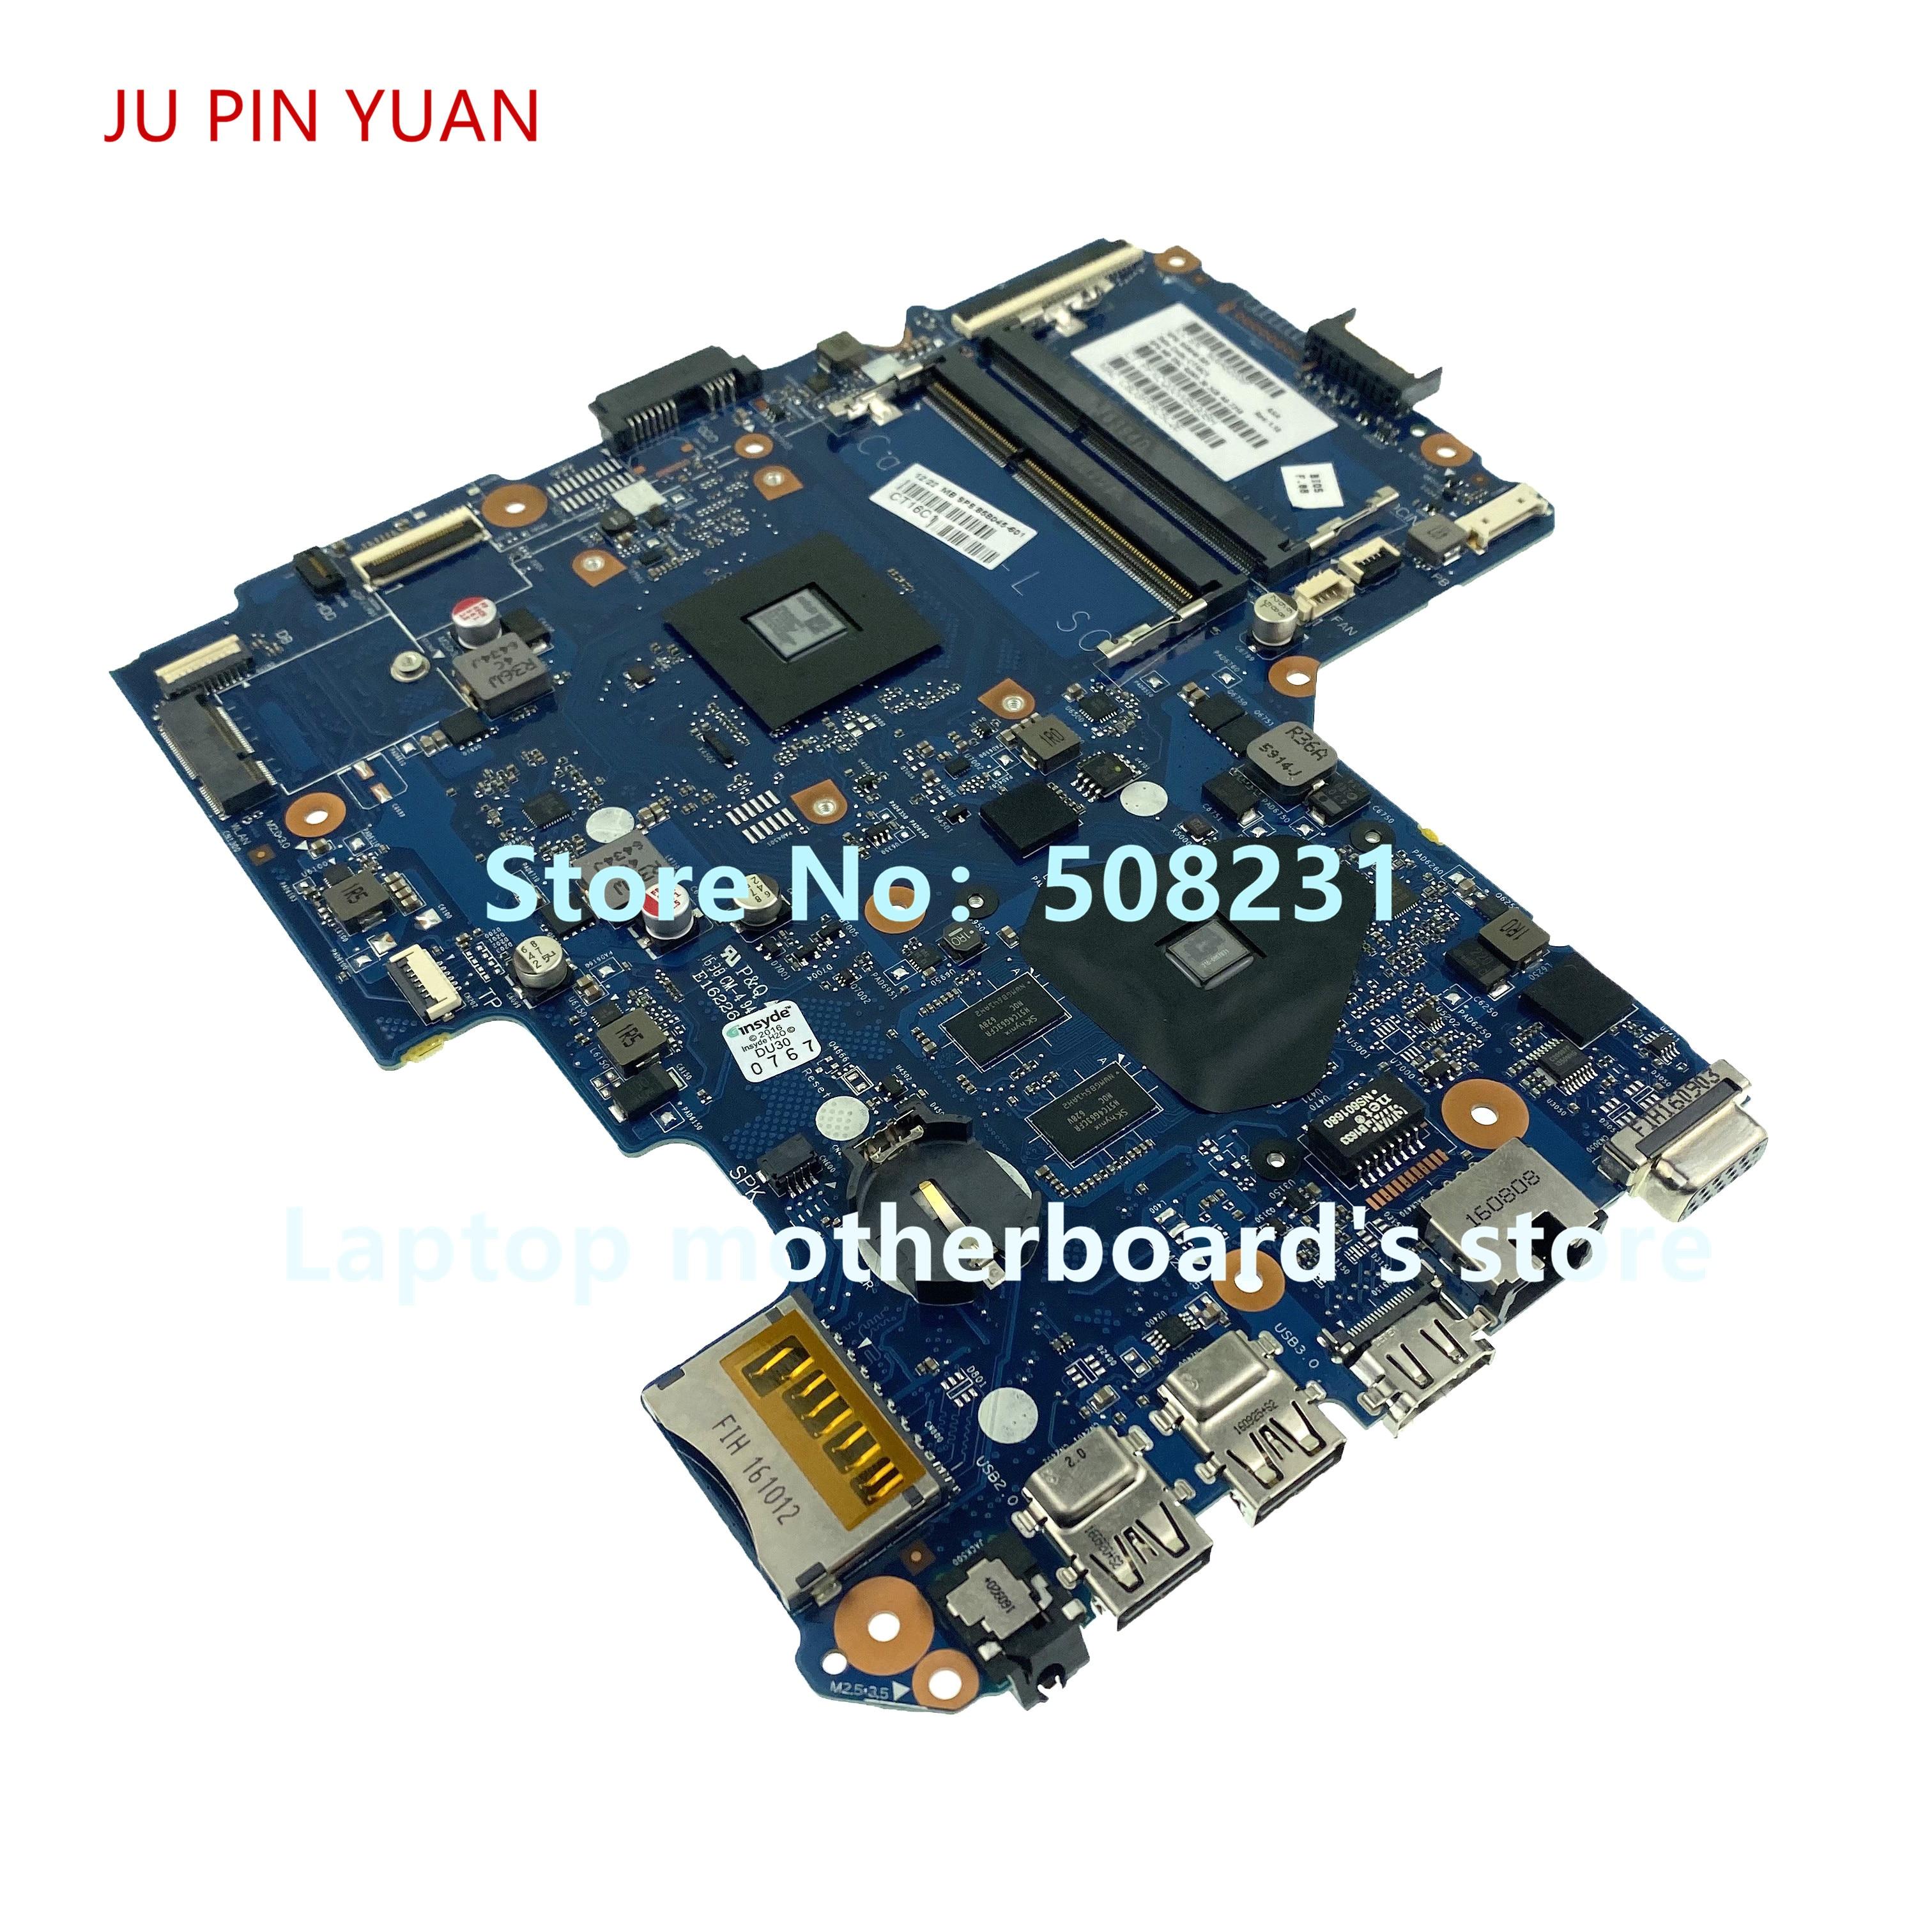 Ju pin yuan para HP 14-un ordenador portátil placa base 858045-601, 858045-501 placa base R5M1-30 2GB A6-7310 100% totalmente